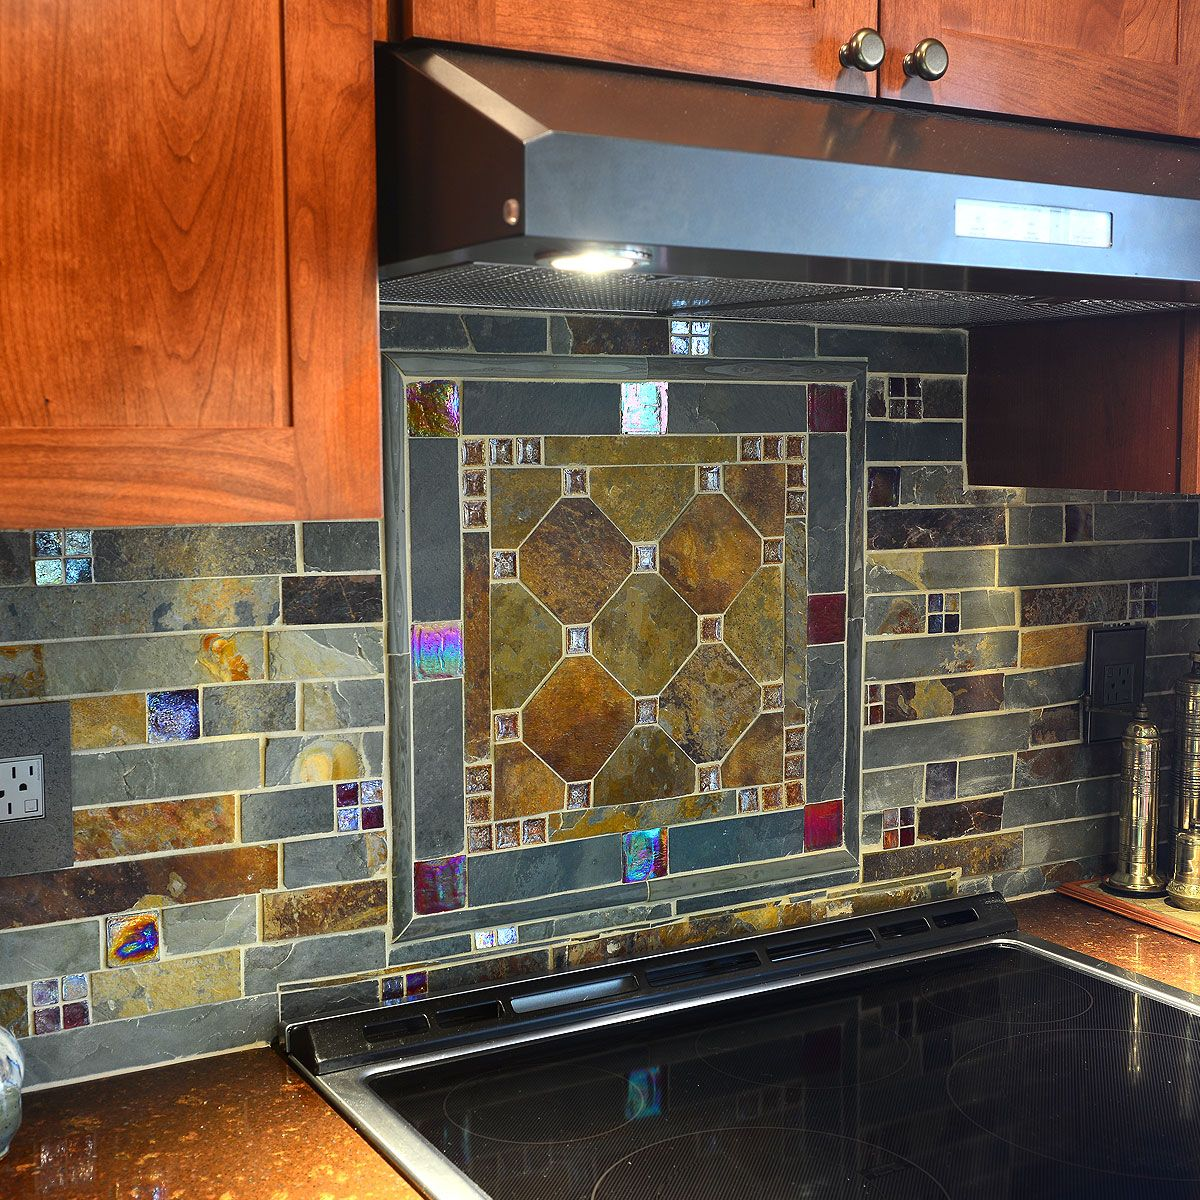 Subway Slate Glass Mosaic Kitchen Backsplash Tile Kitchen Tiles Backsplash Slate Kitchen Backsplash Mosaic Backsplash Kitchen